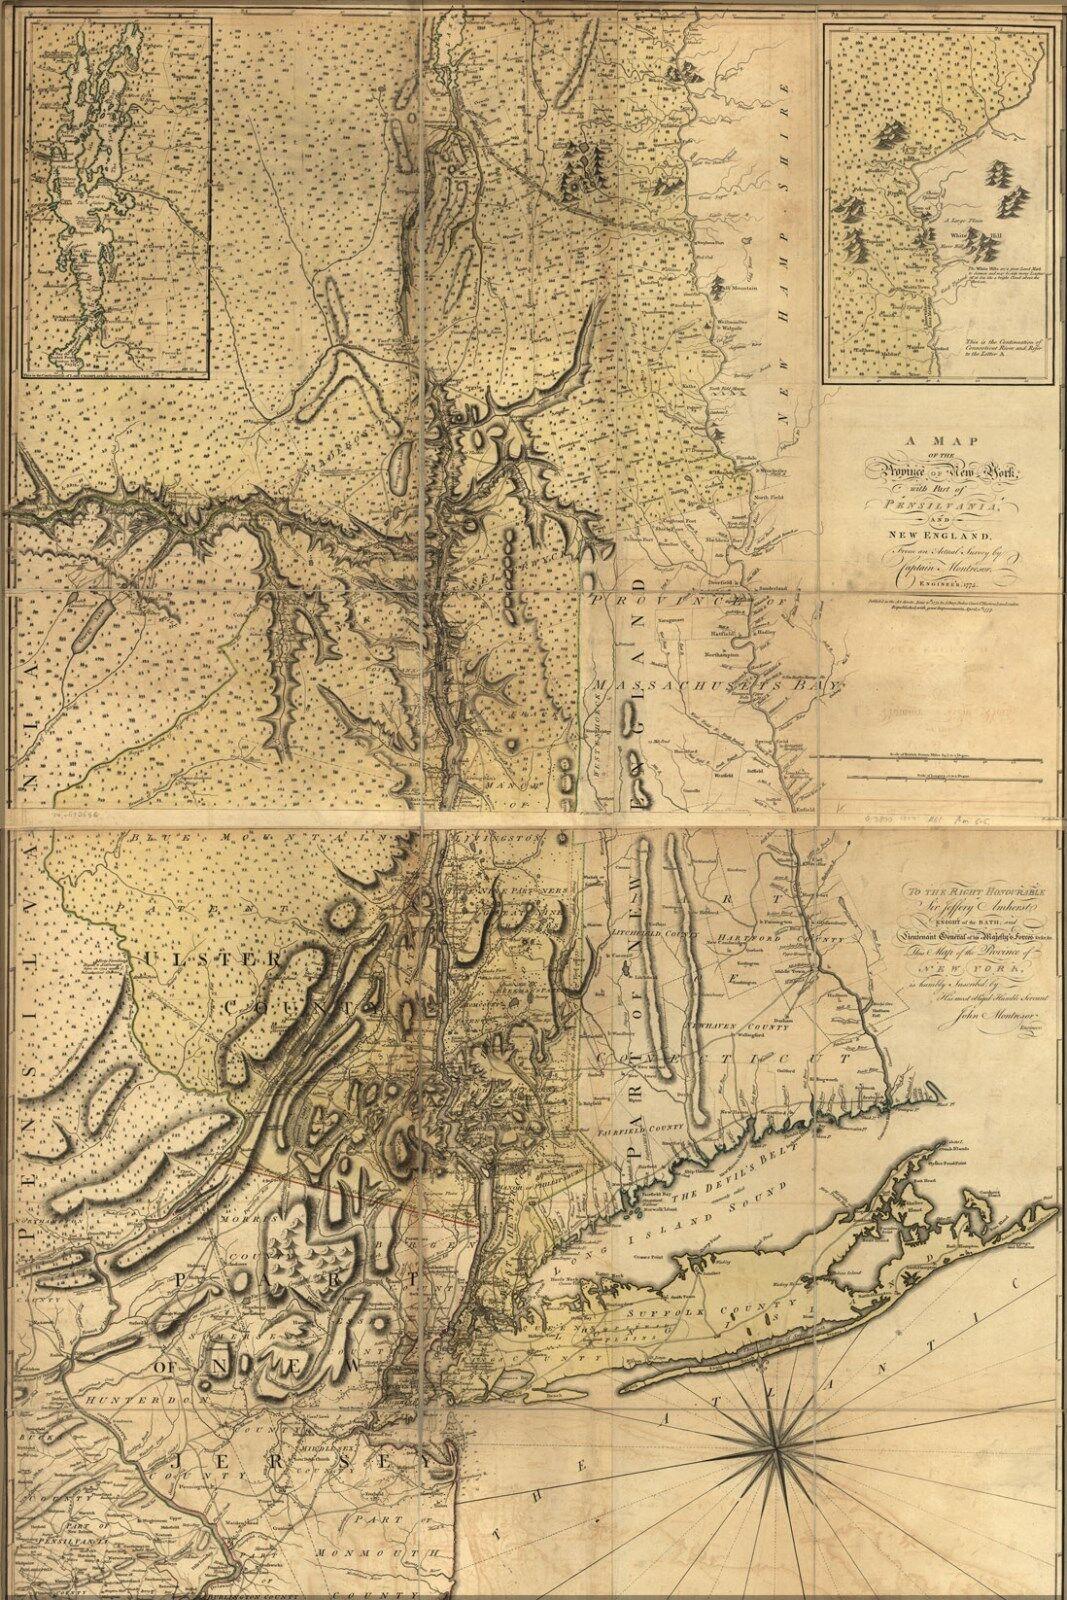 Poster, Many Größes; Map Of New York City Long Island Area 1775 P1